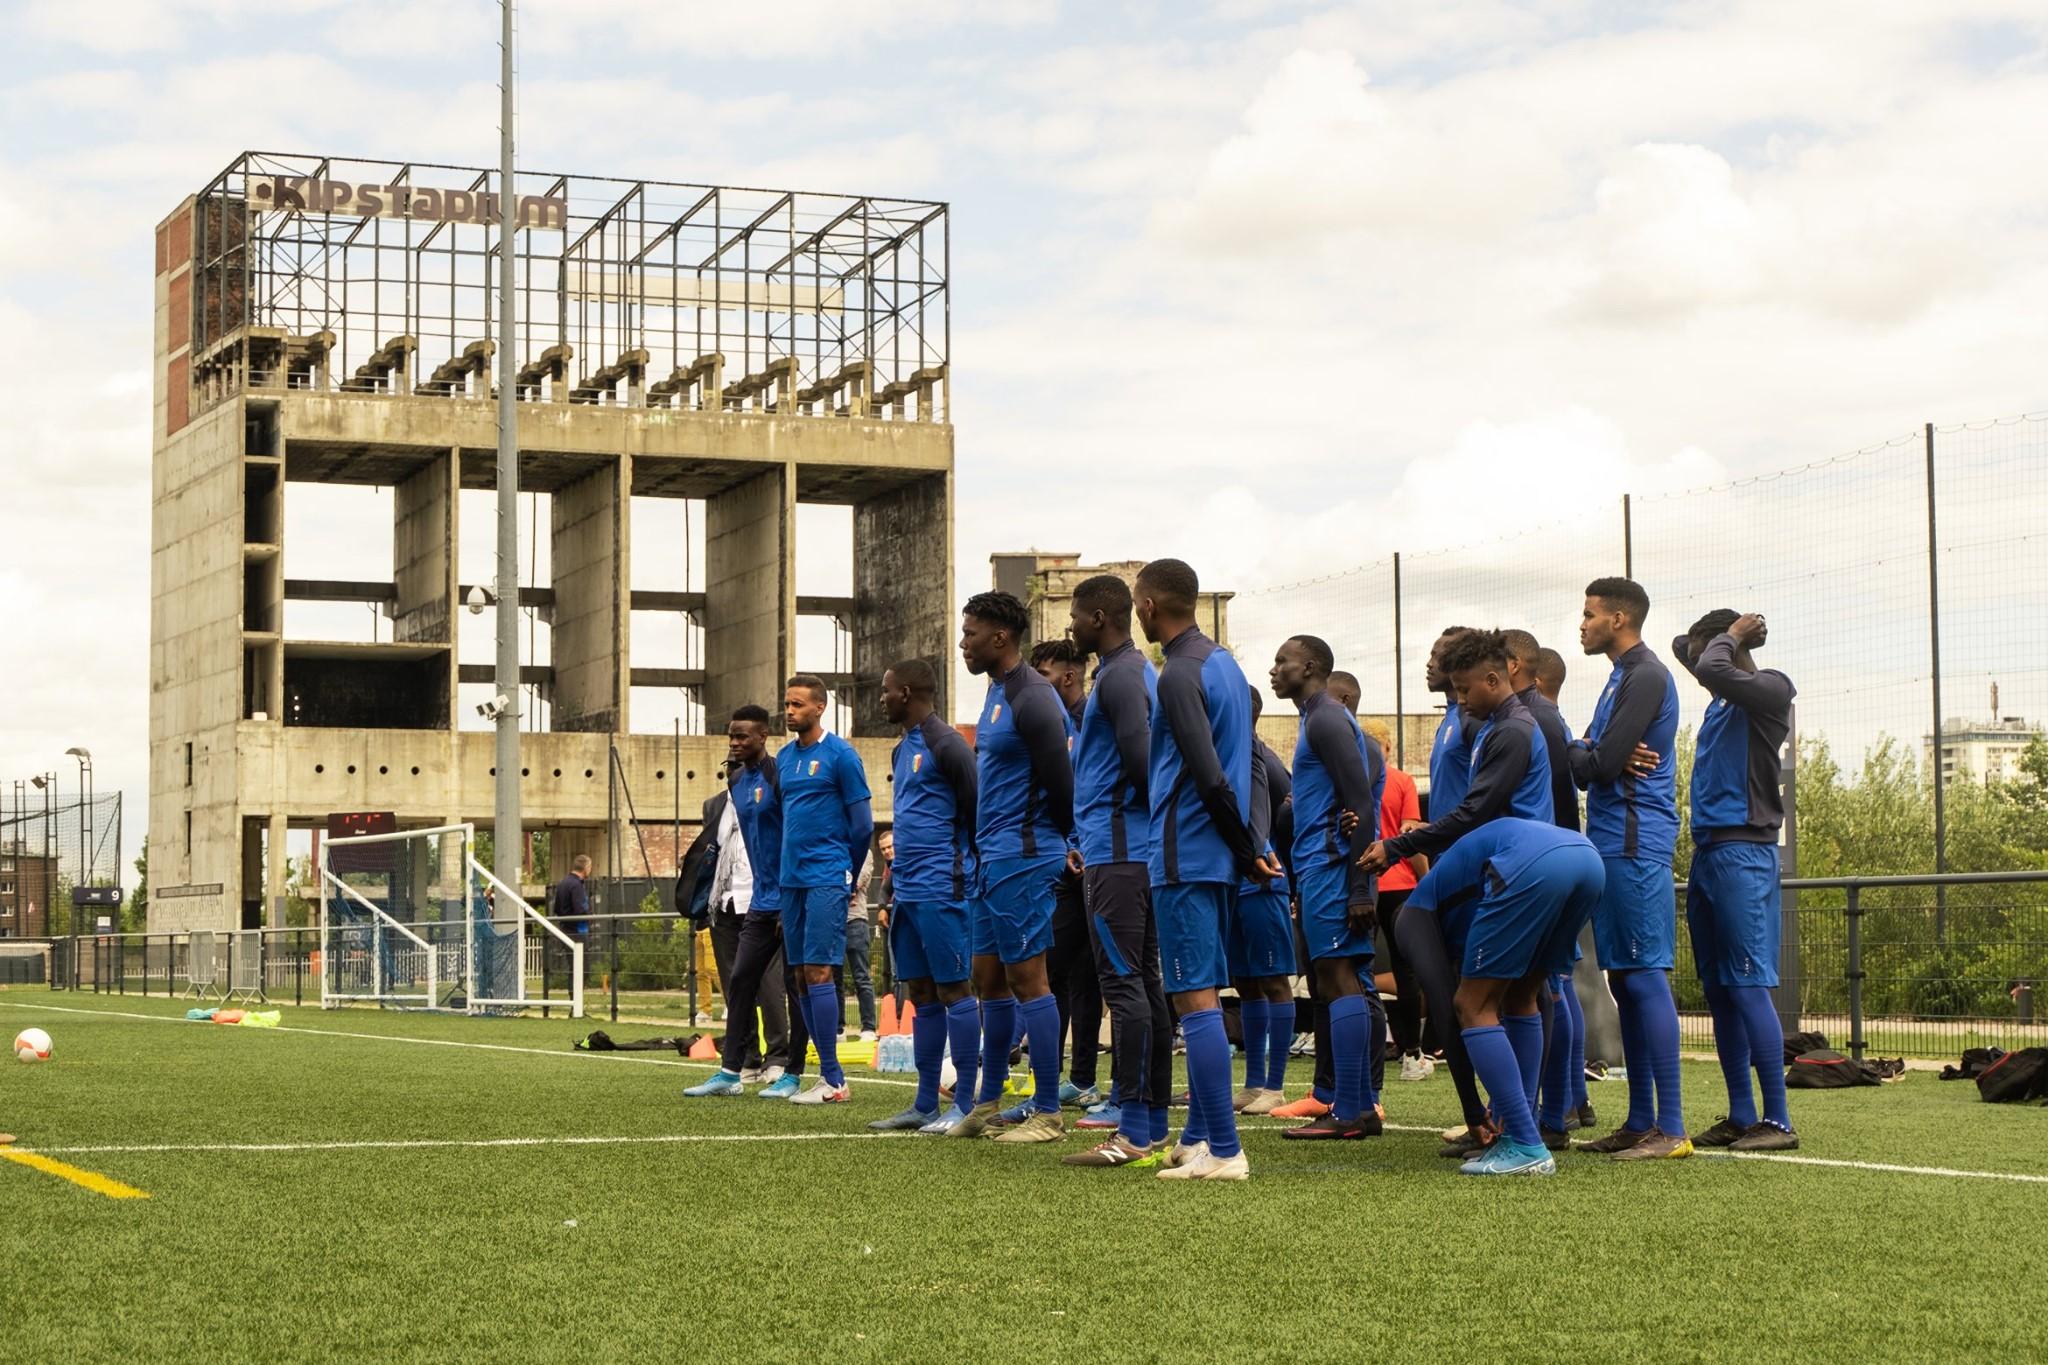 Football : la marque Kipsta devient l'équipementier des SAO du Tchad. ©DR/Kipsta